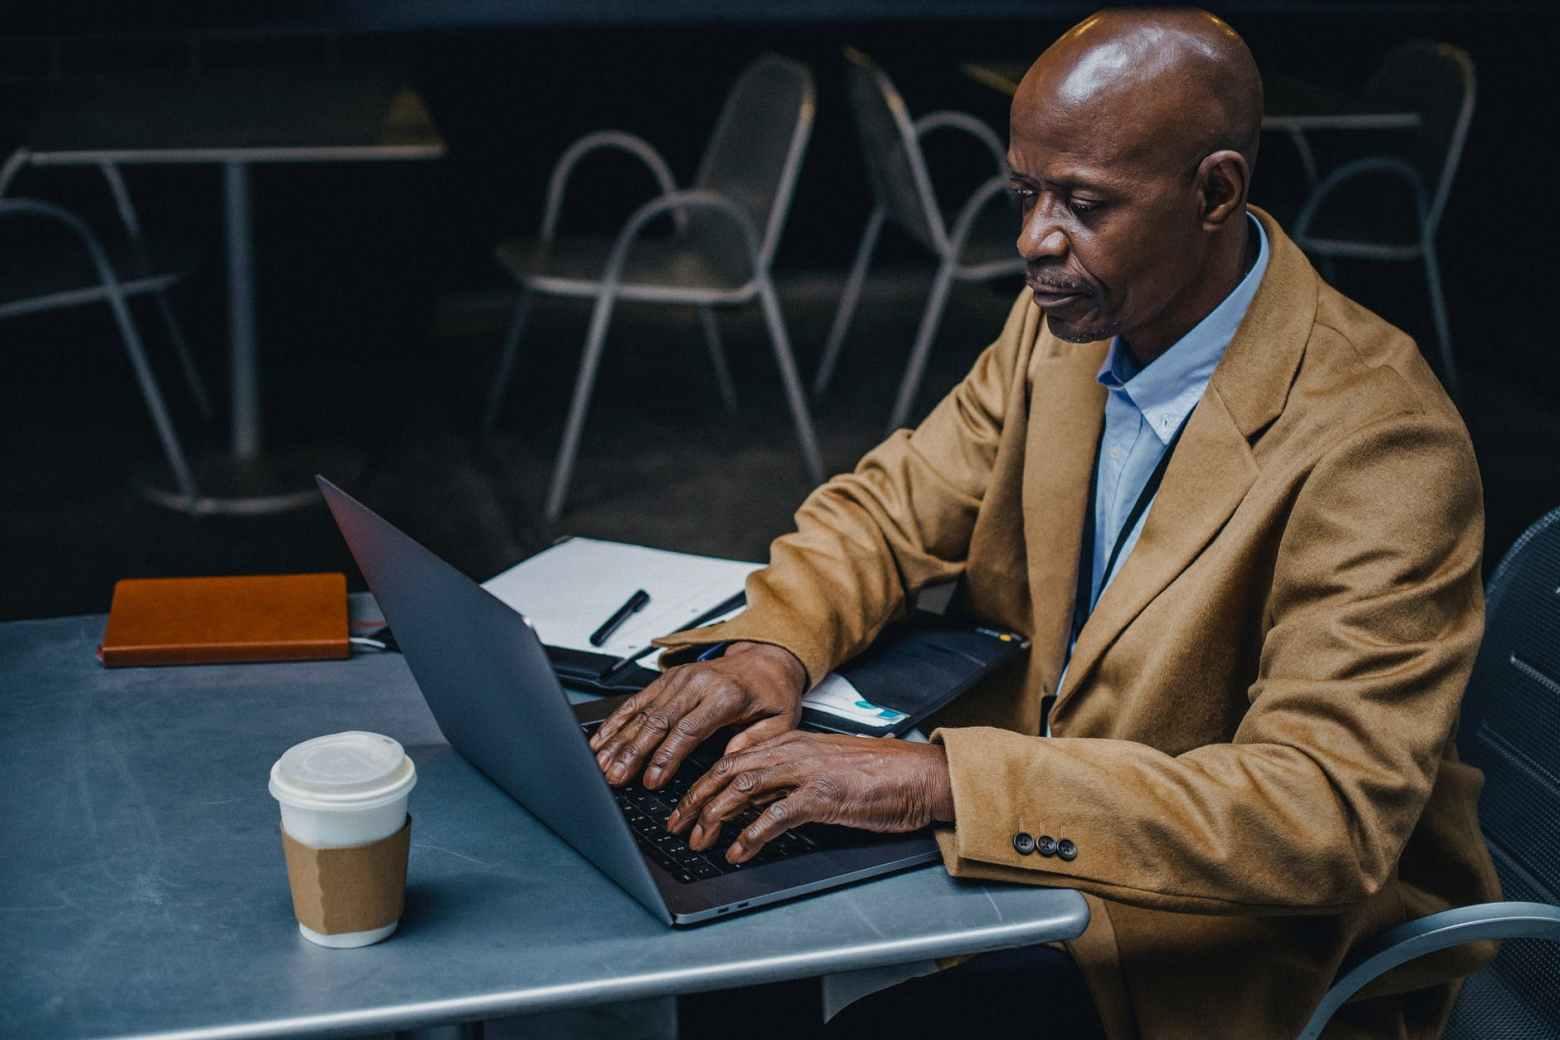 black man typing important information on laptop